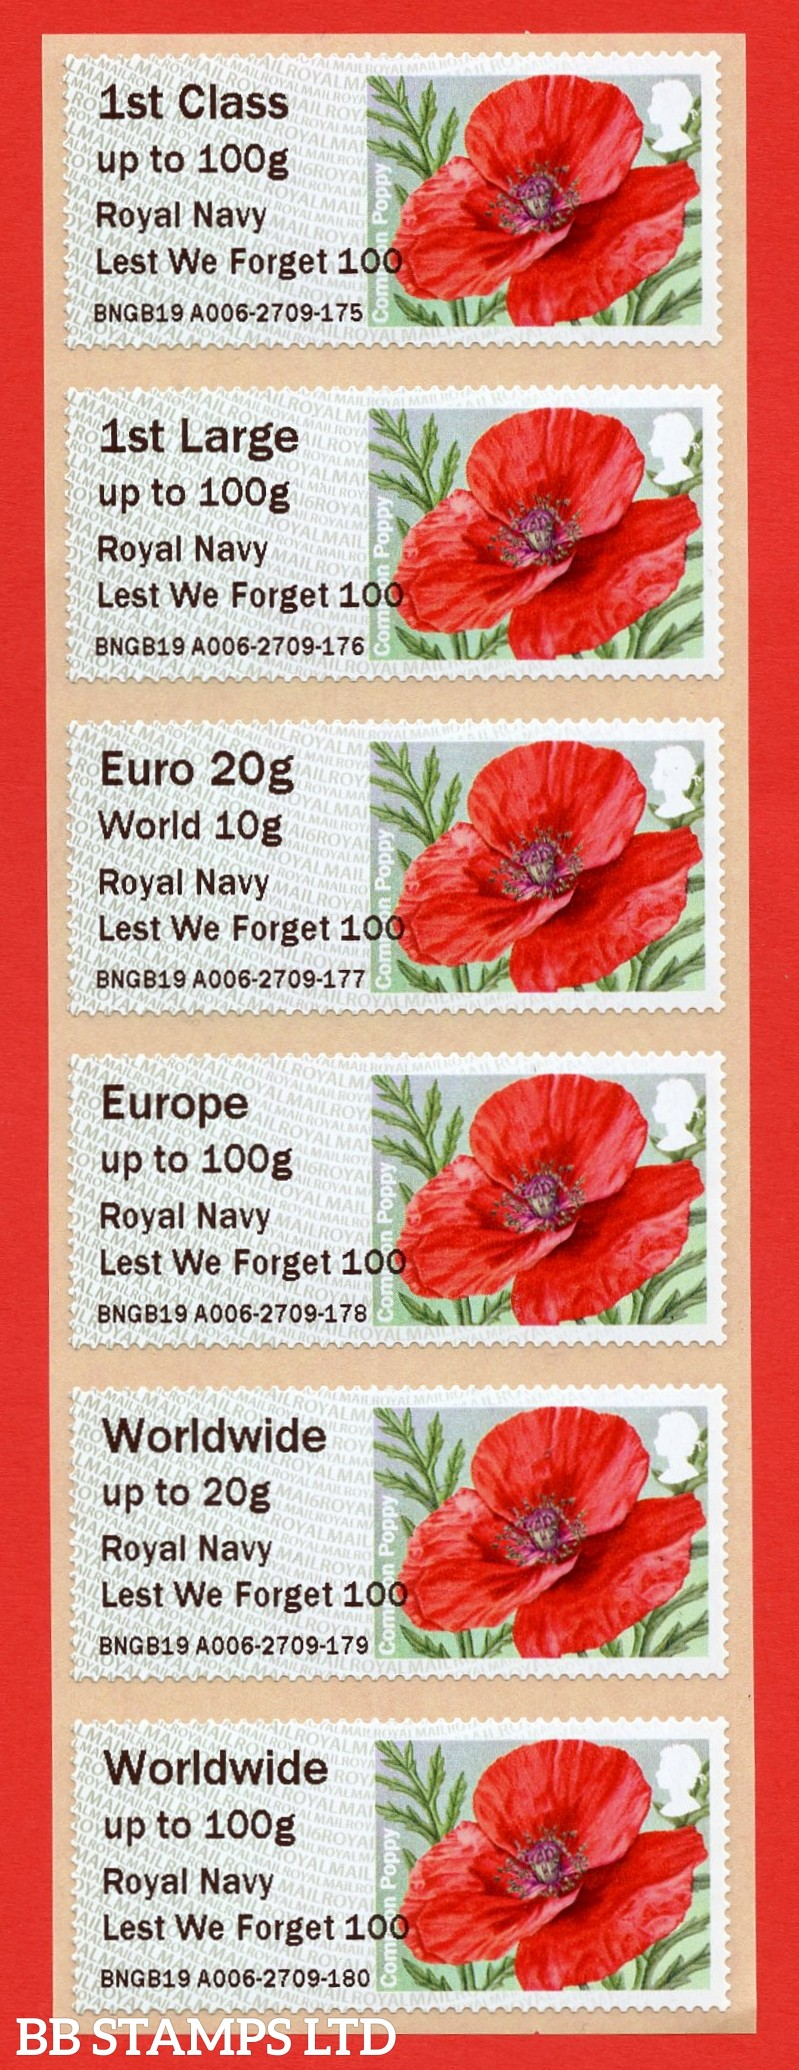 Poppy Royal Navy Lest We Forget 100 1st - W/Wide 100g MA16: TIIIA (BK29,P10)